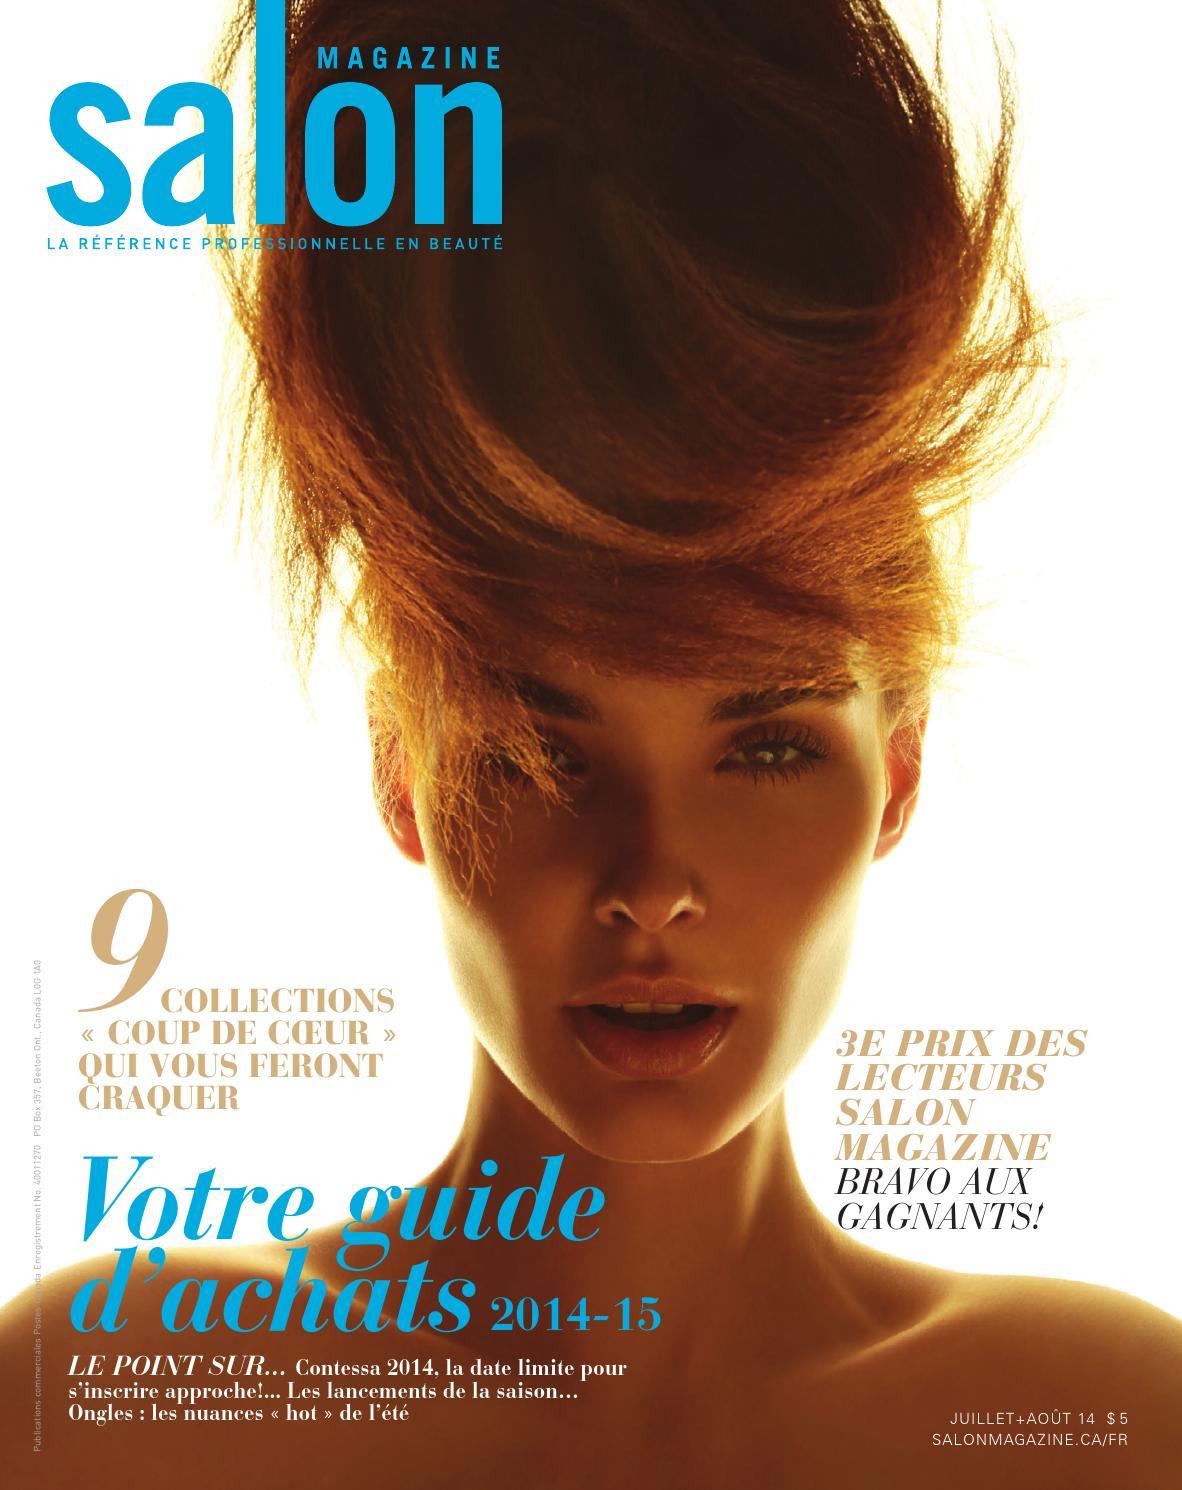 Hair amp nail choices aiibeauty - Salon Magazine Dition Fran Ais Juillet Ao T 2014 By Salon Communications Inc Issuu